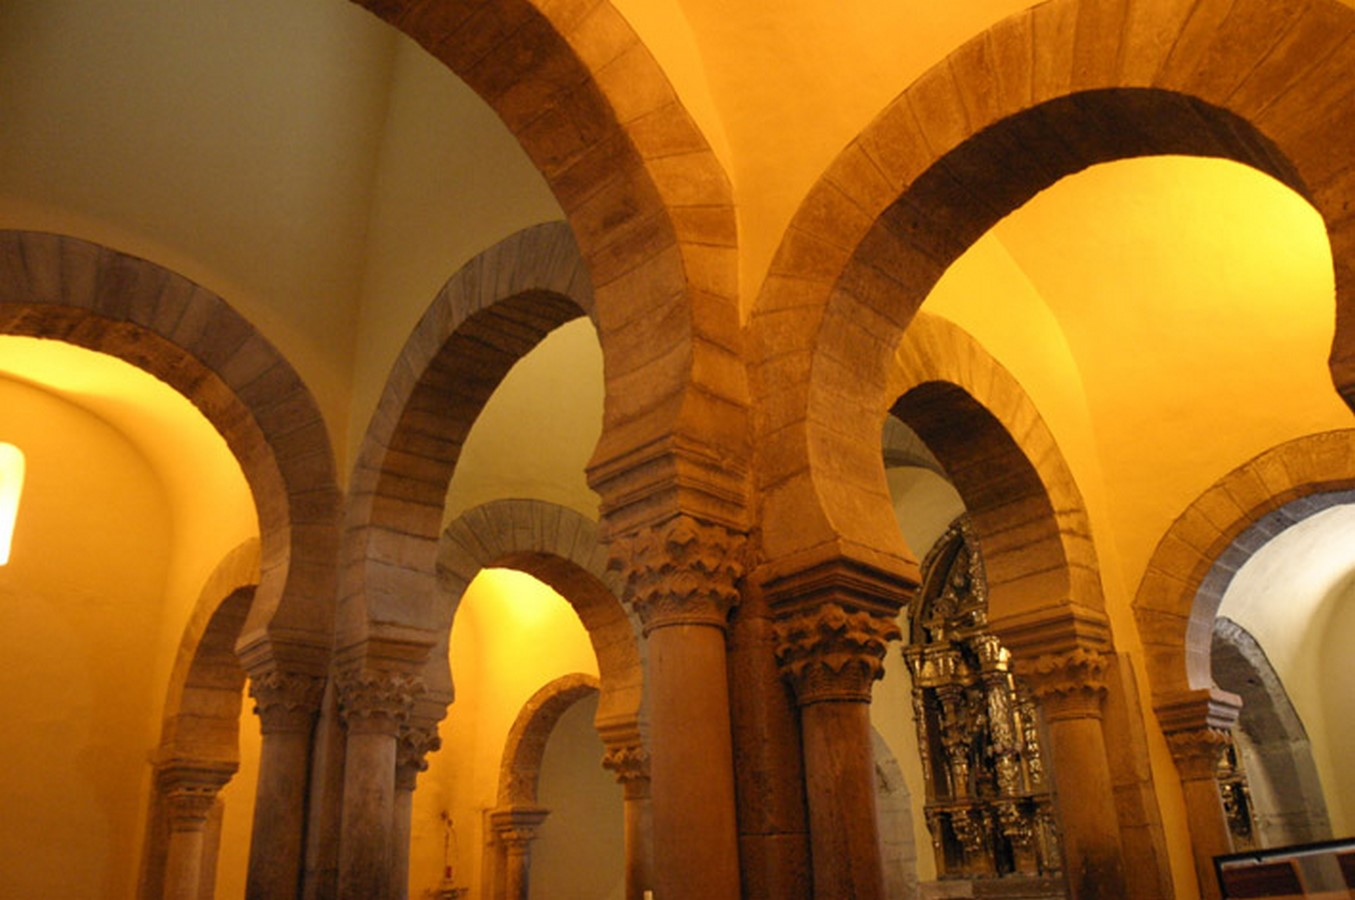 Repoblación Architecture: Pre-Romanesque Architecture - Sheet6